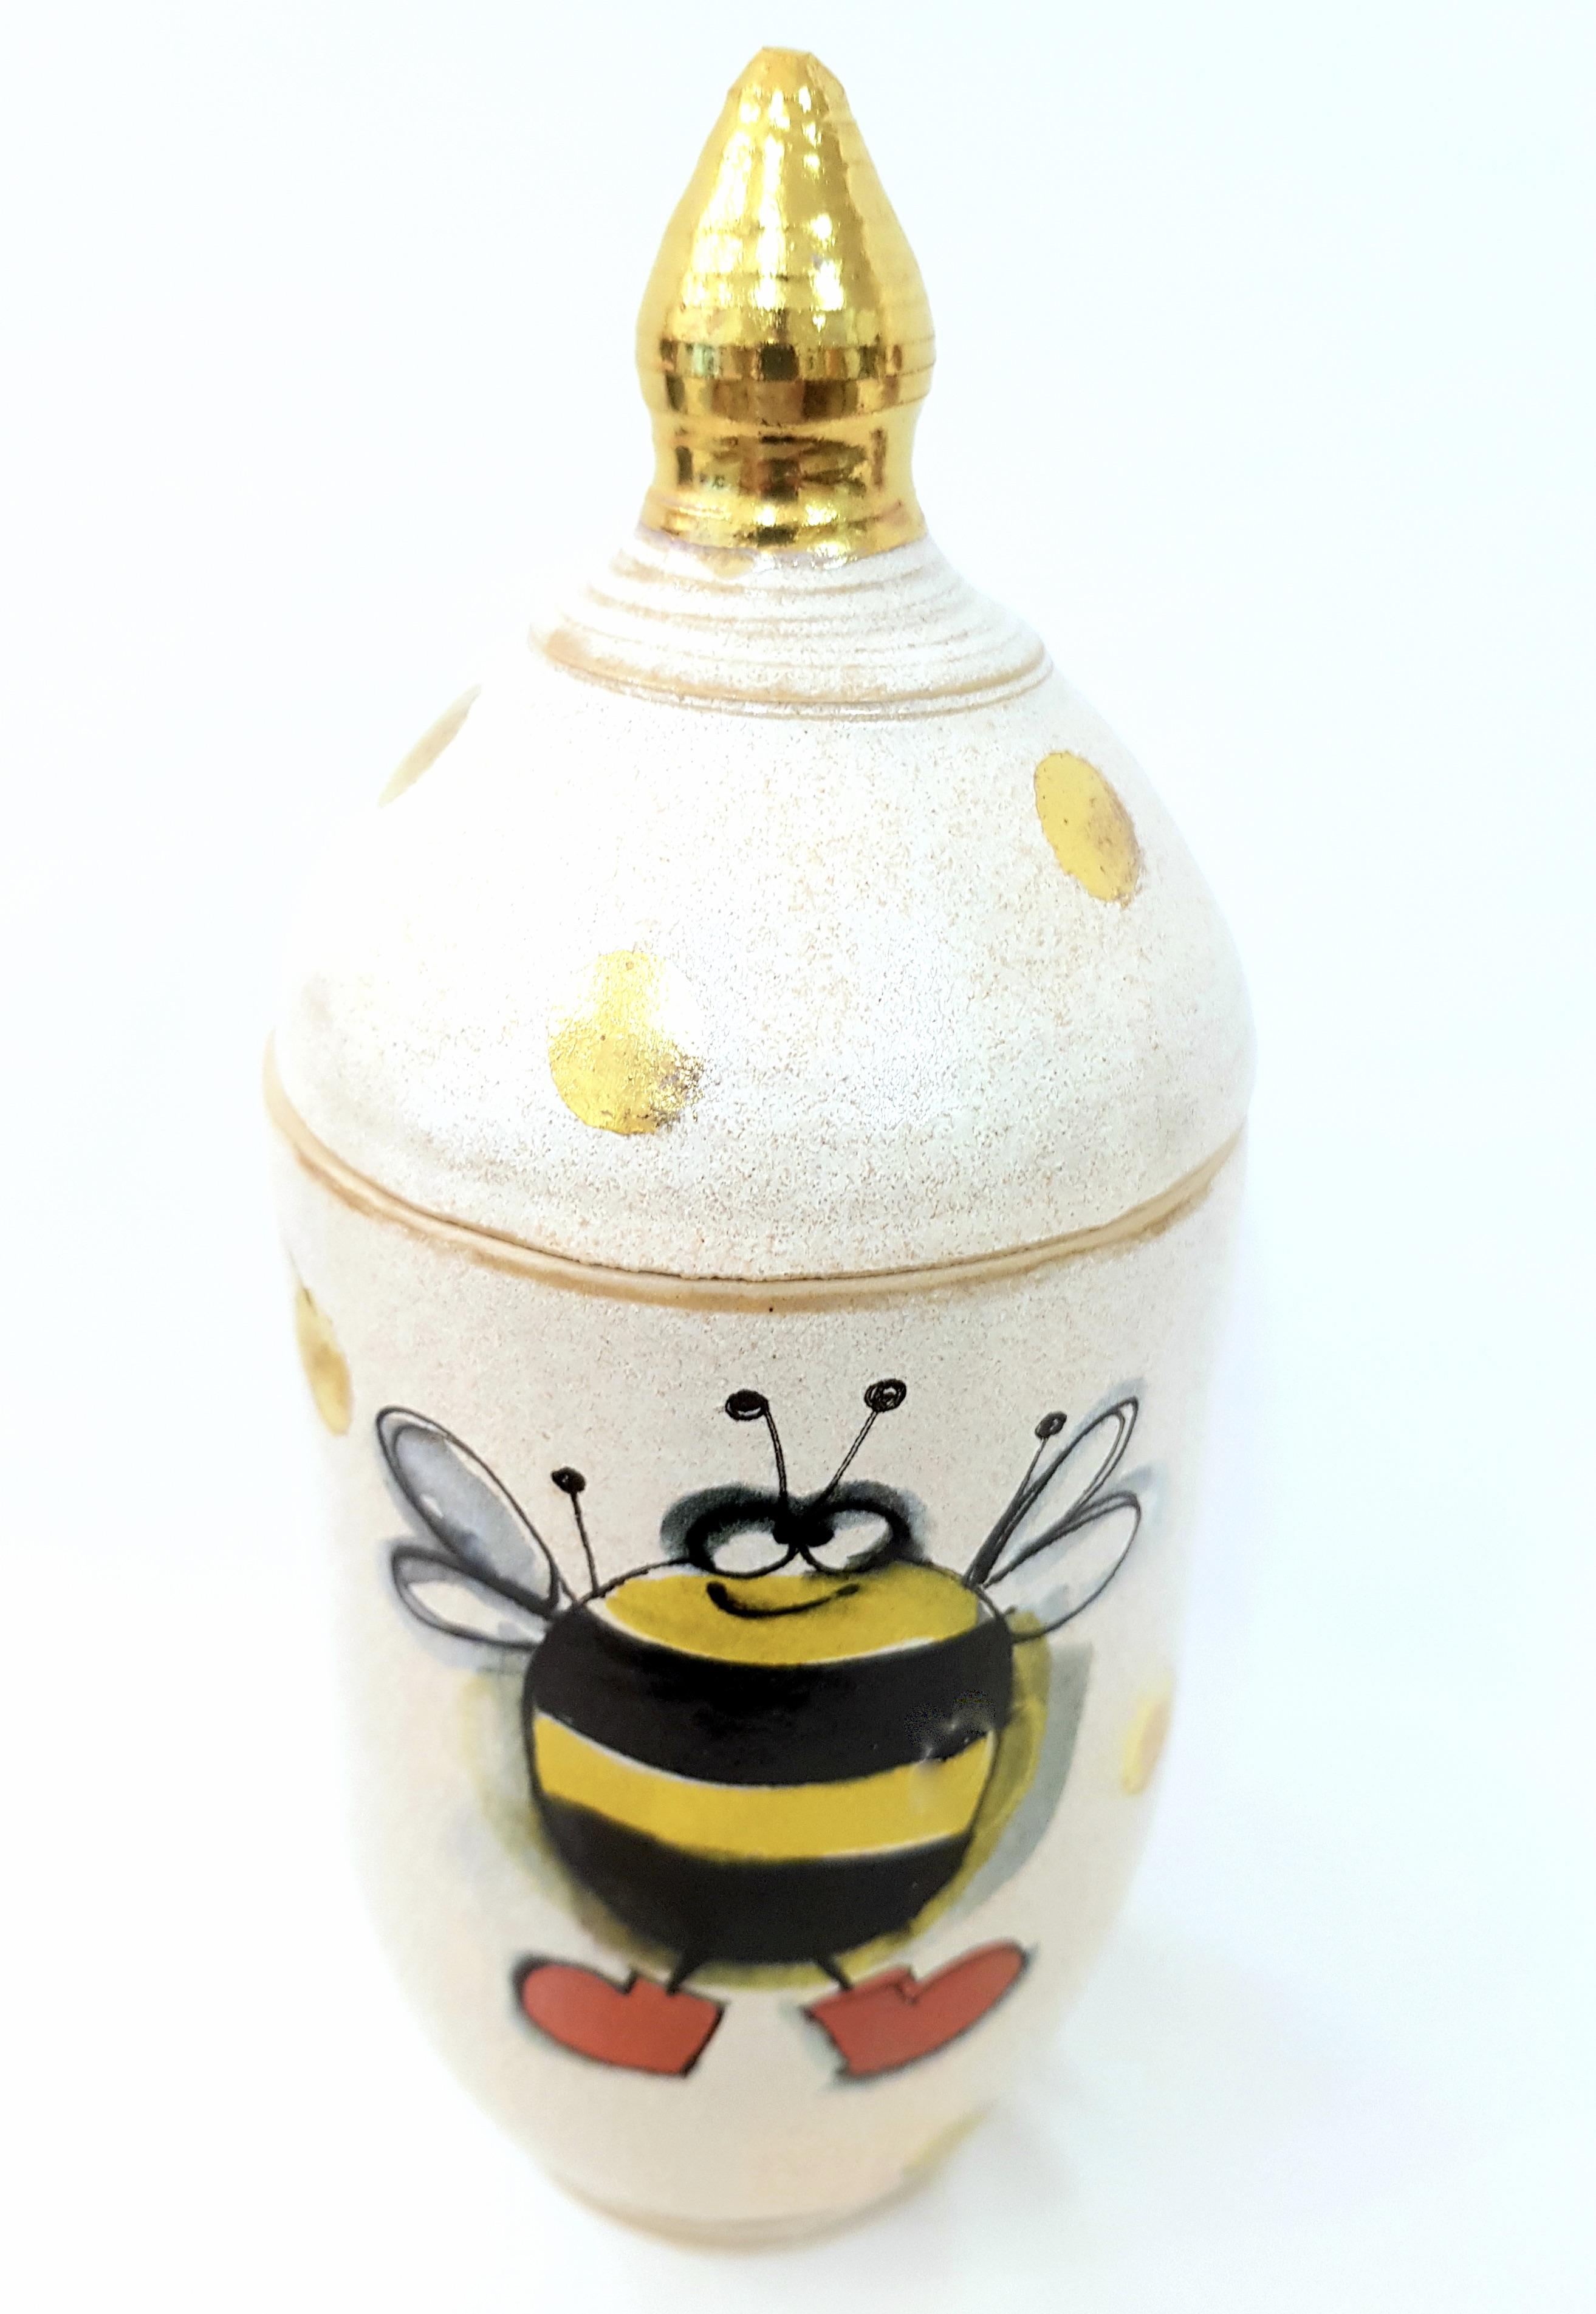 Kinderdose, Keramik, Töpferei la ceramica Basel, online shop, Kurse